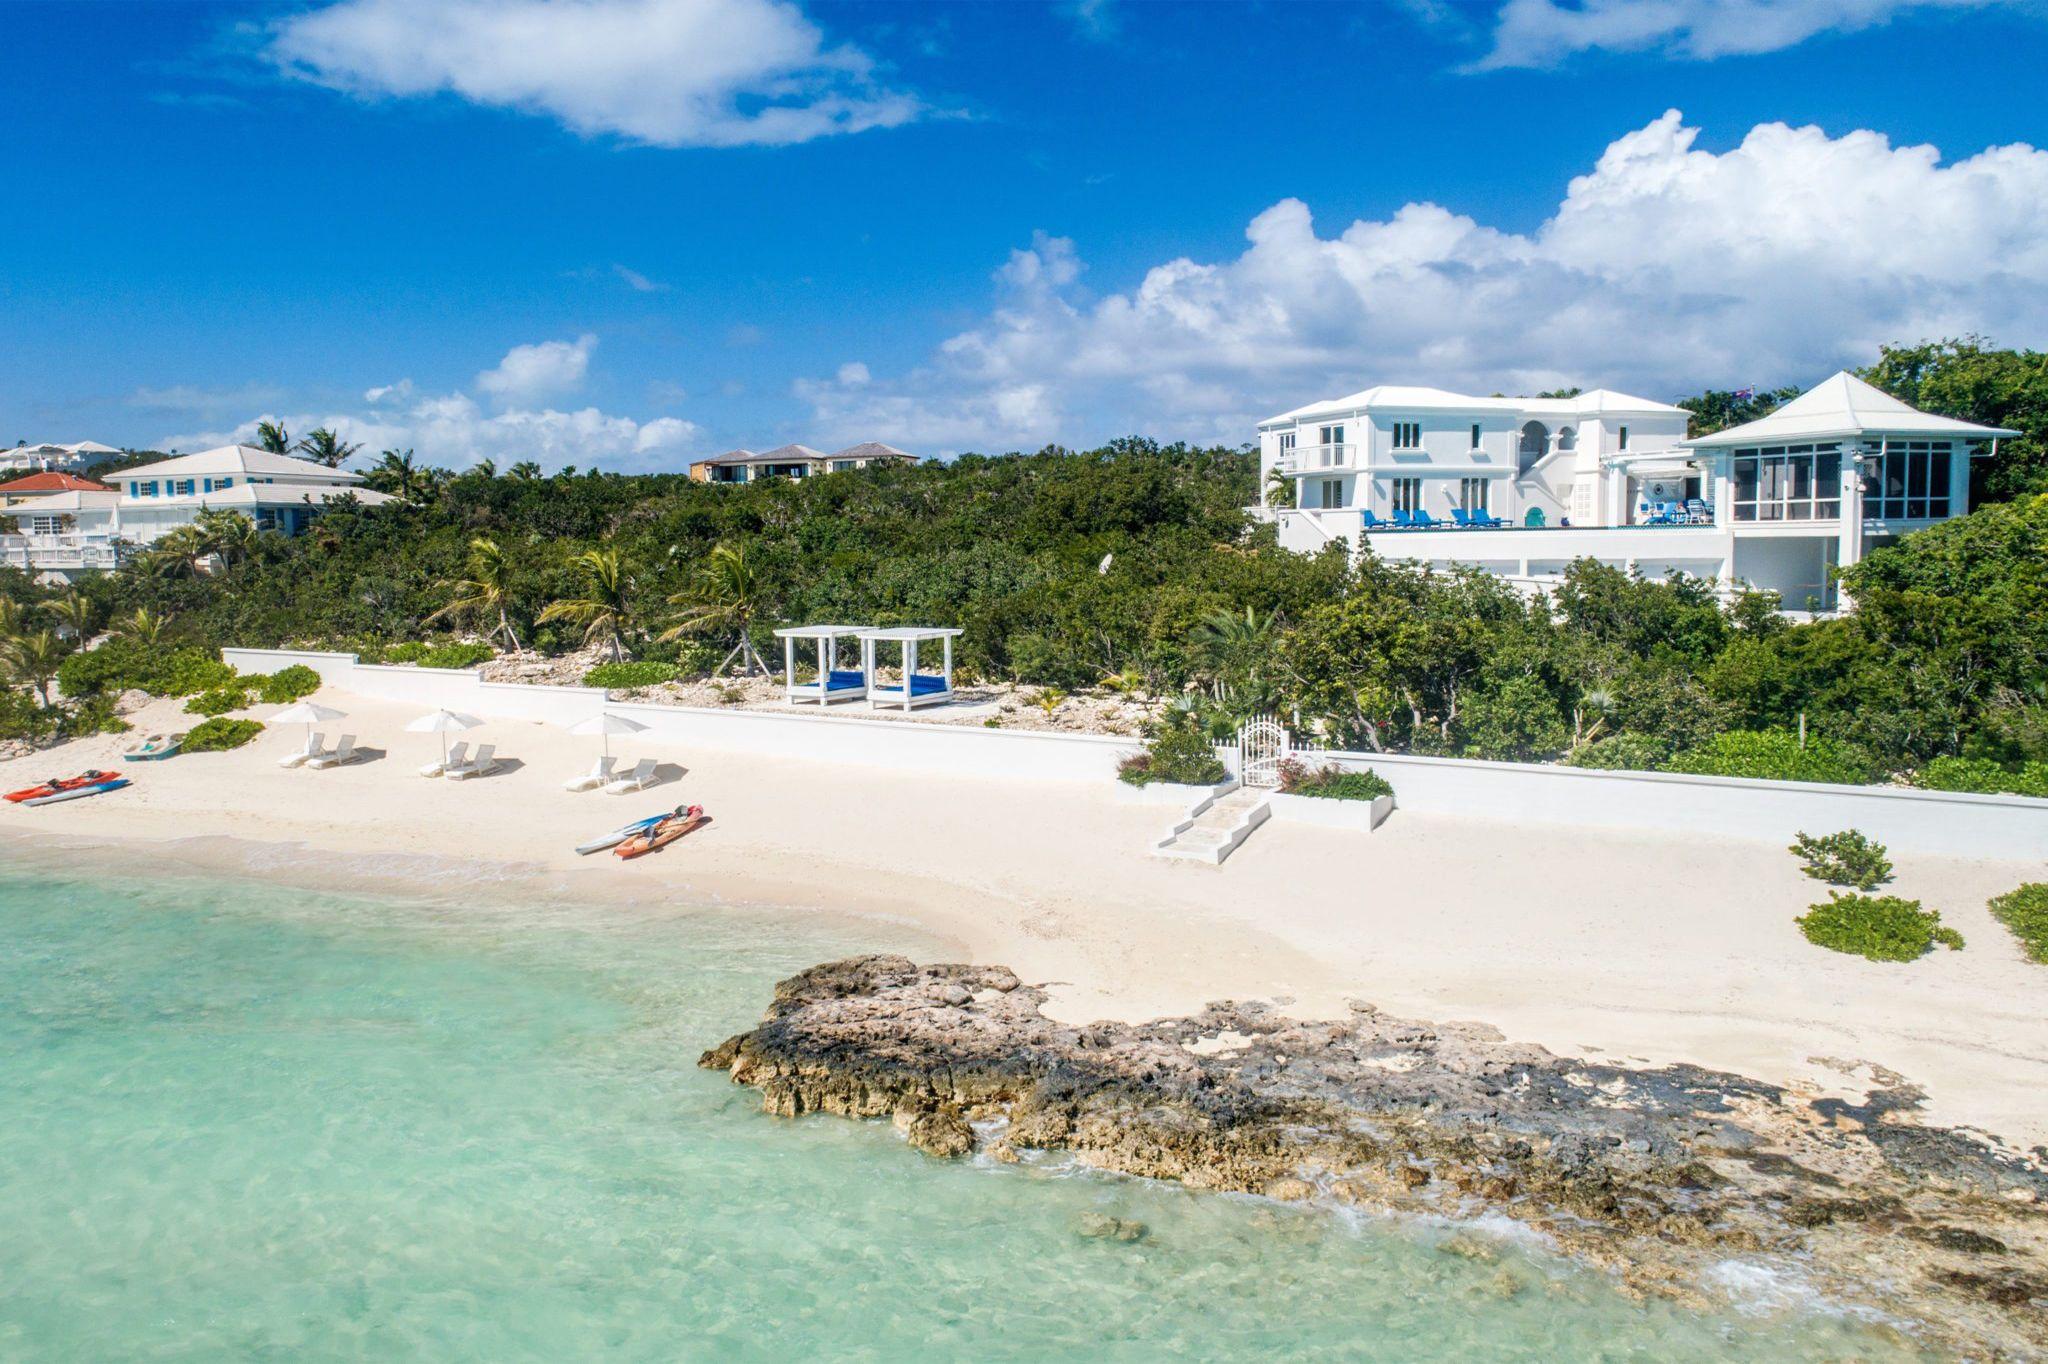 vacationcaribeanrentals com offers vacation rentals in dominican rh pinterest com